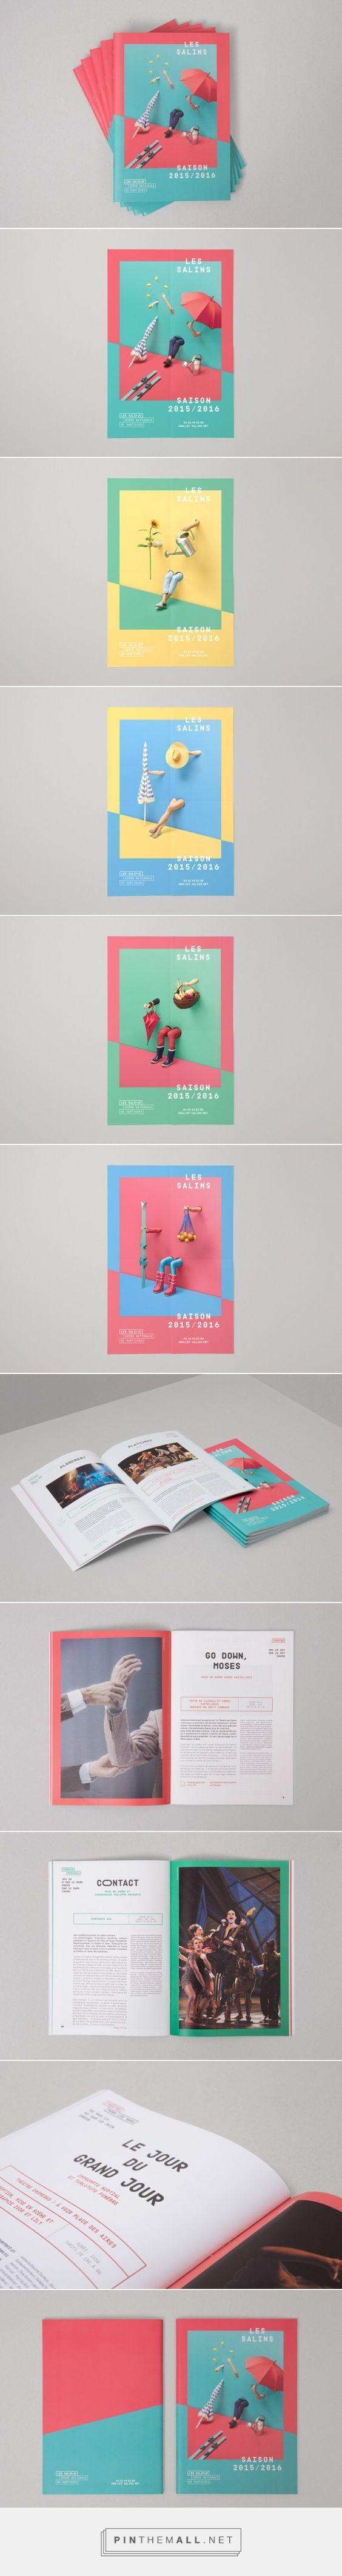 四季主題的表演刊物設計 | MyDesy 淘靈感... - a grouped images picture - Pin Them All: